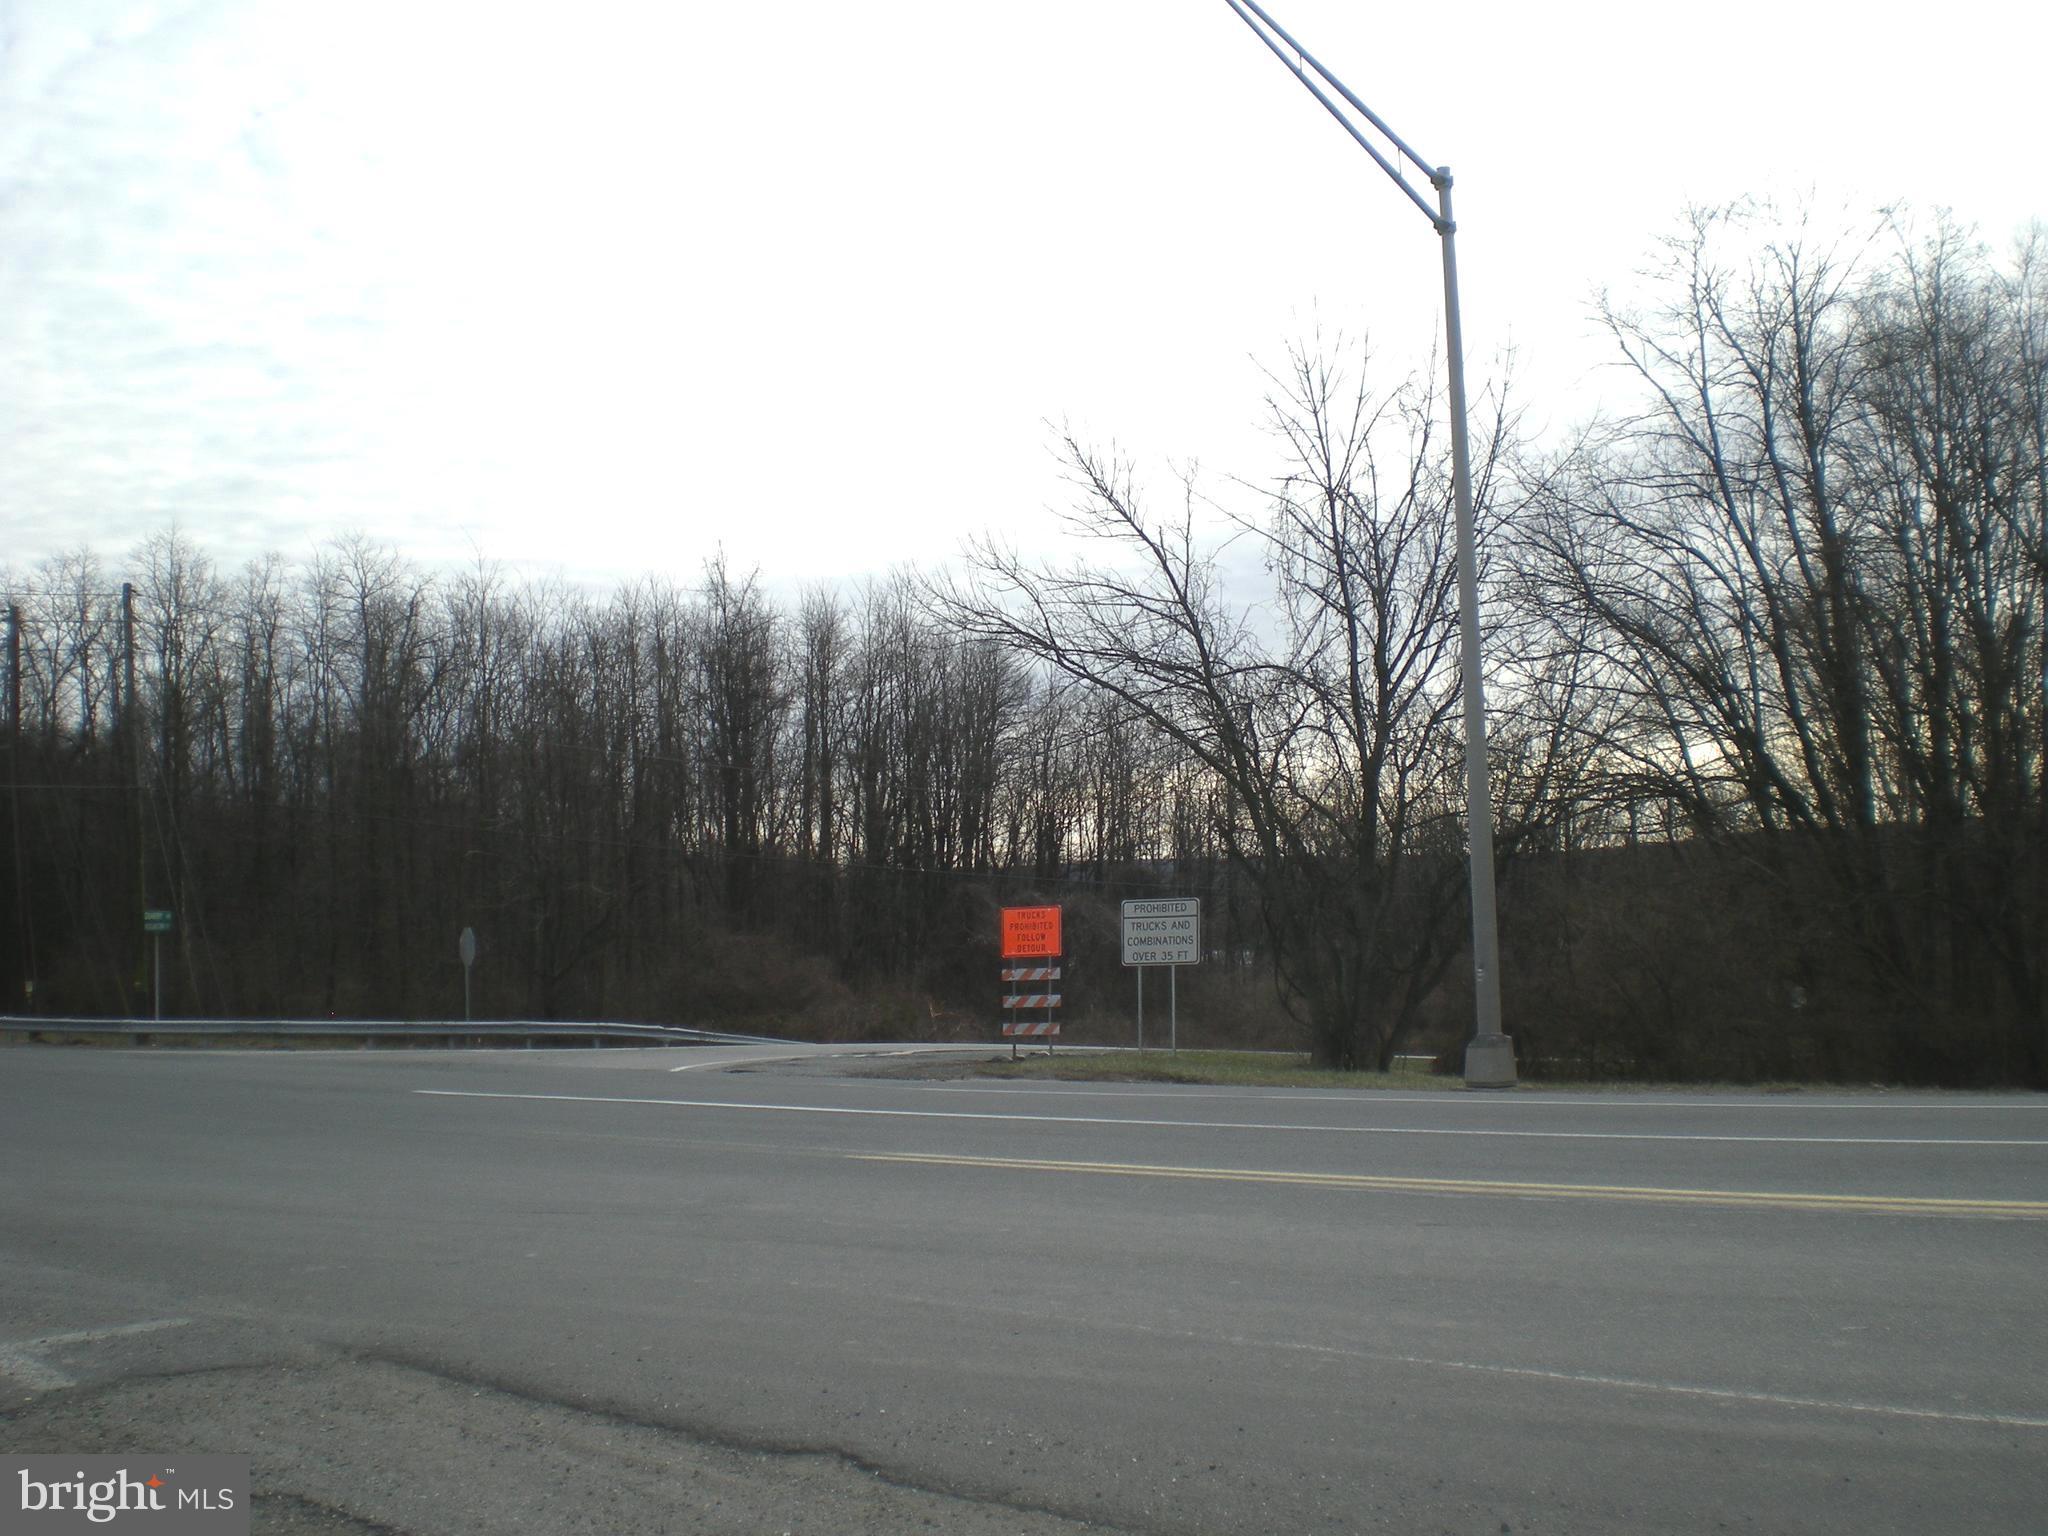 0 S Quarry Road, Morgantown, PA 19543